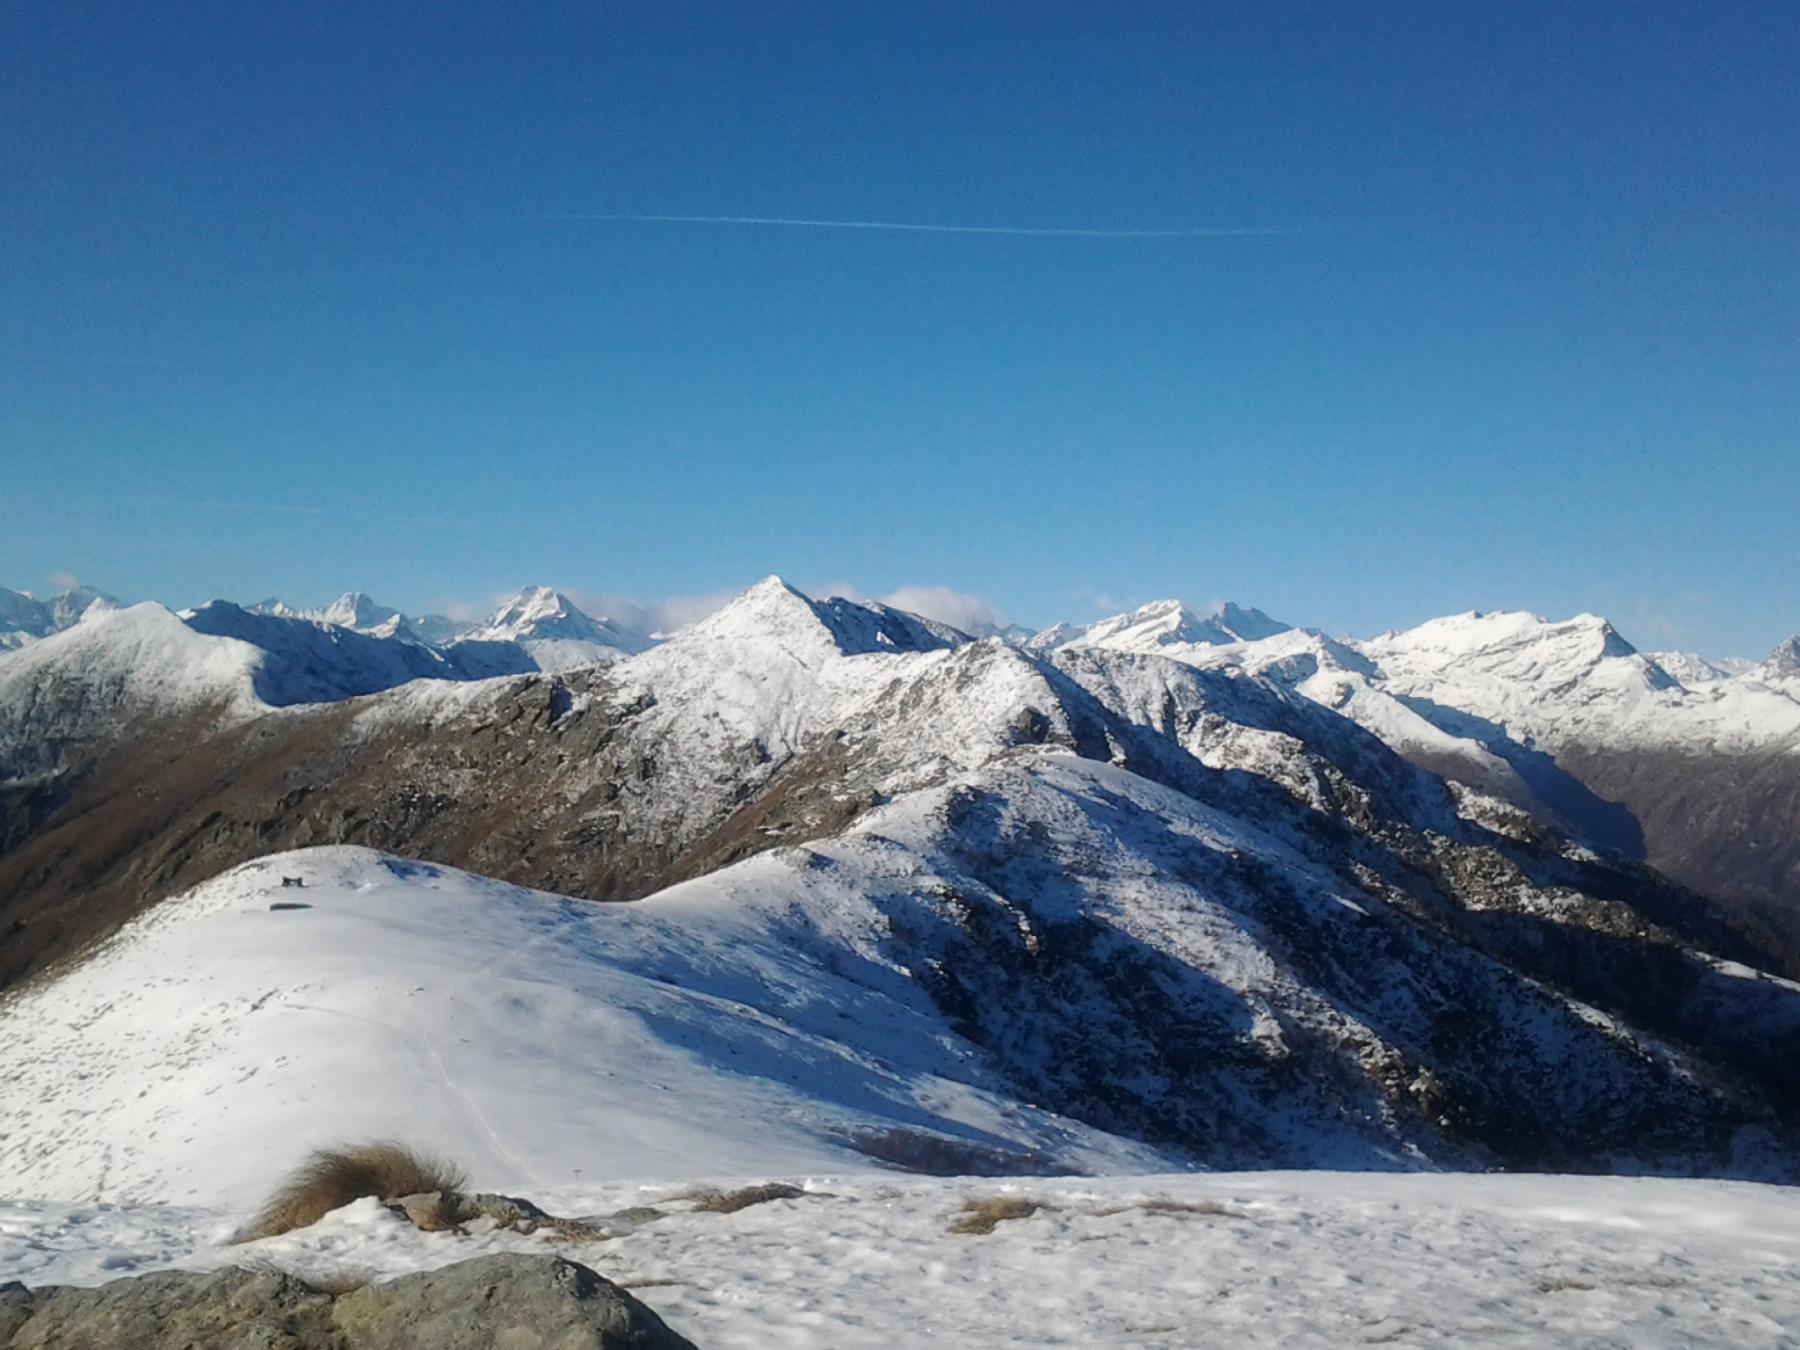 poca neve verso l'alta valle